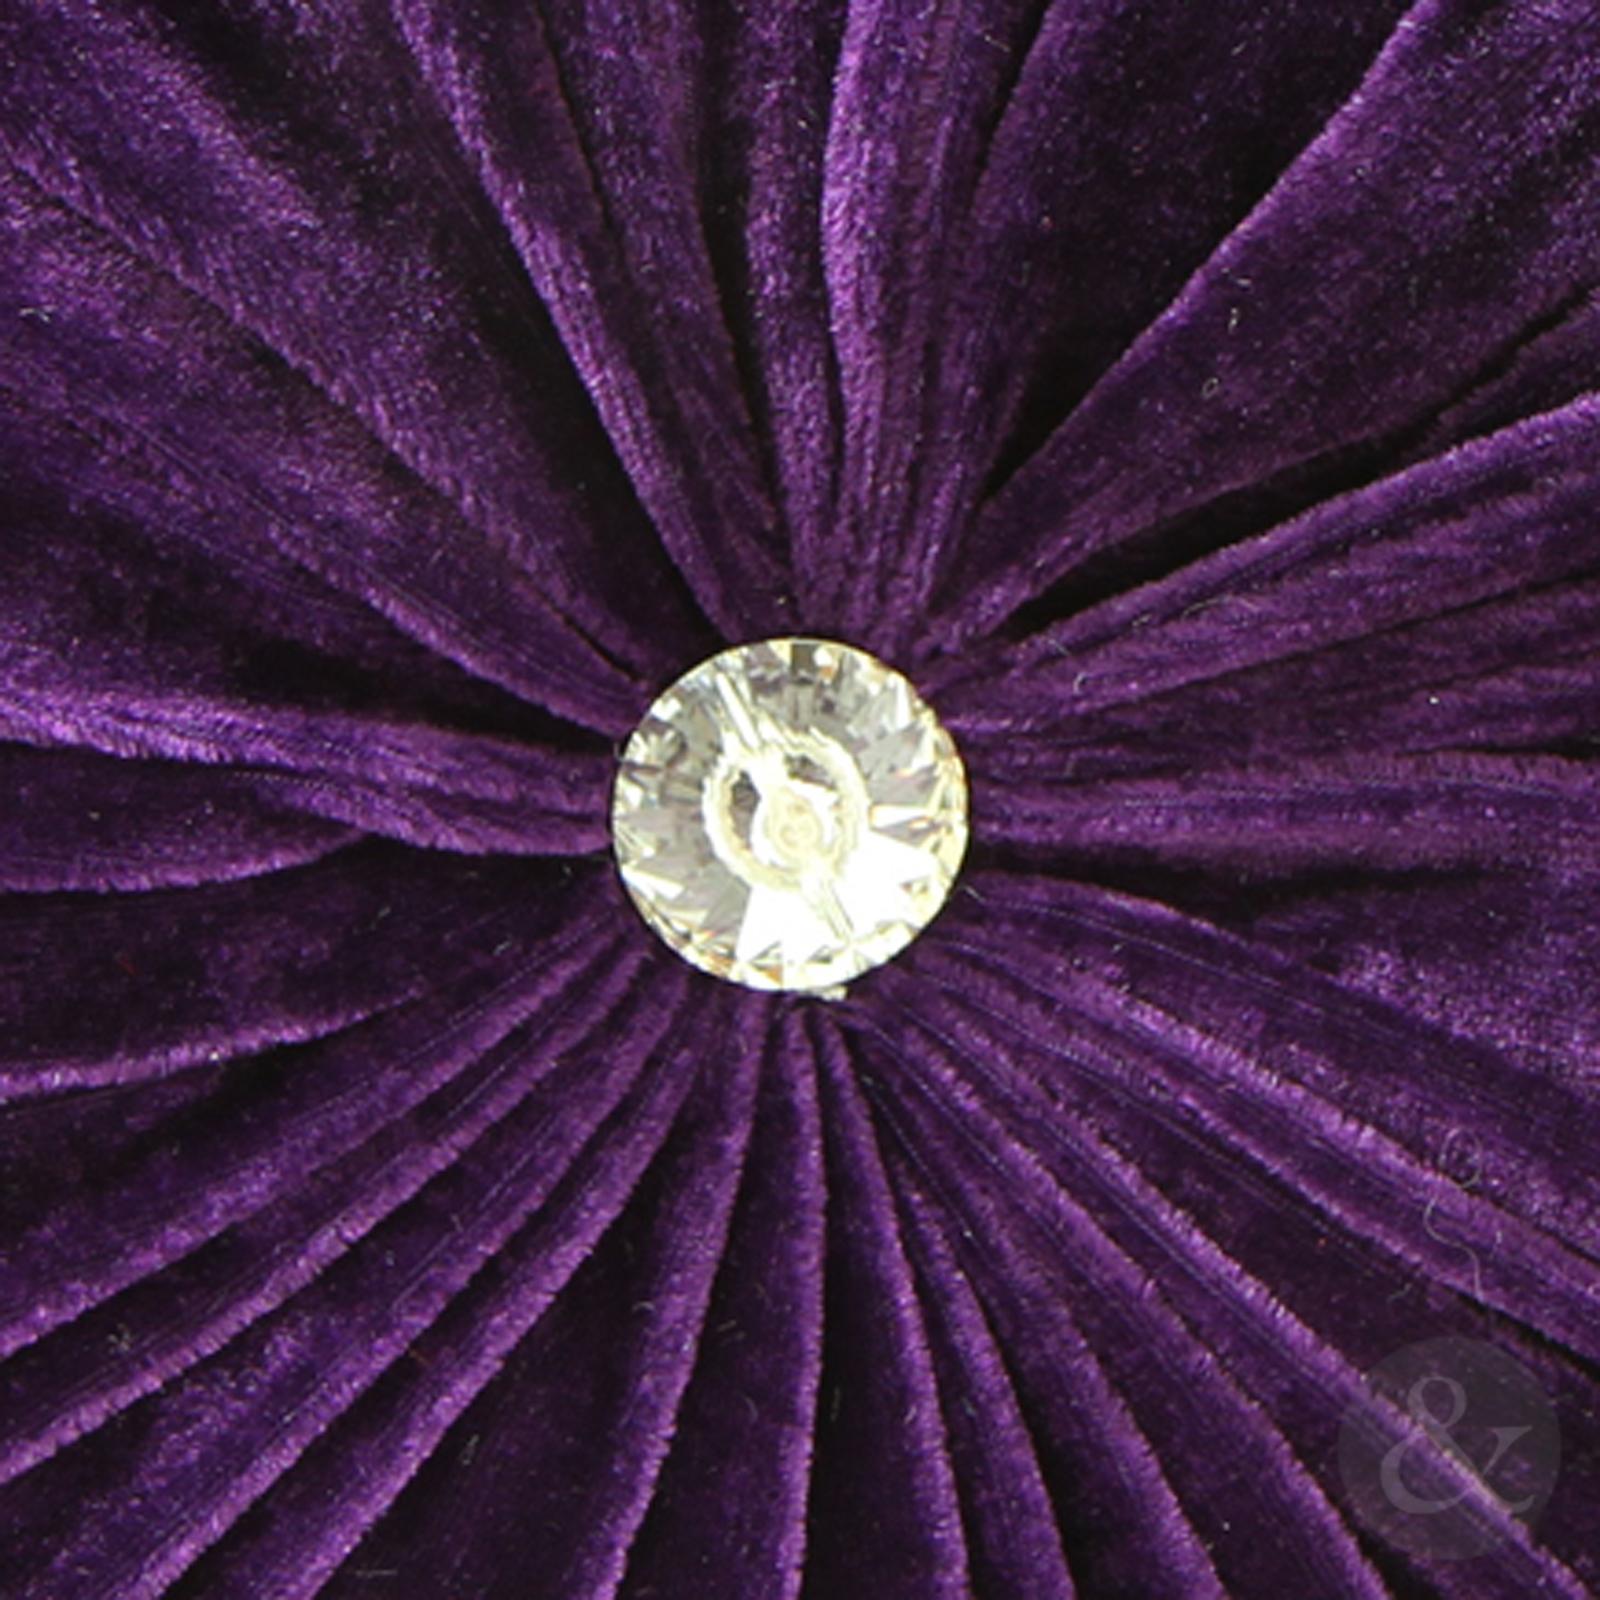 Round Velvet Cushions Purple Pink Luxury Diamante Chic  : diamond purpecloseup from www.ebay.com size 1600 x 1600 jpeg 1108kB